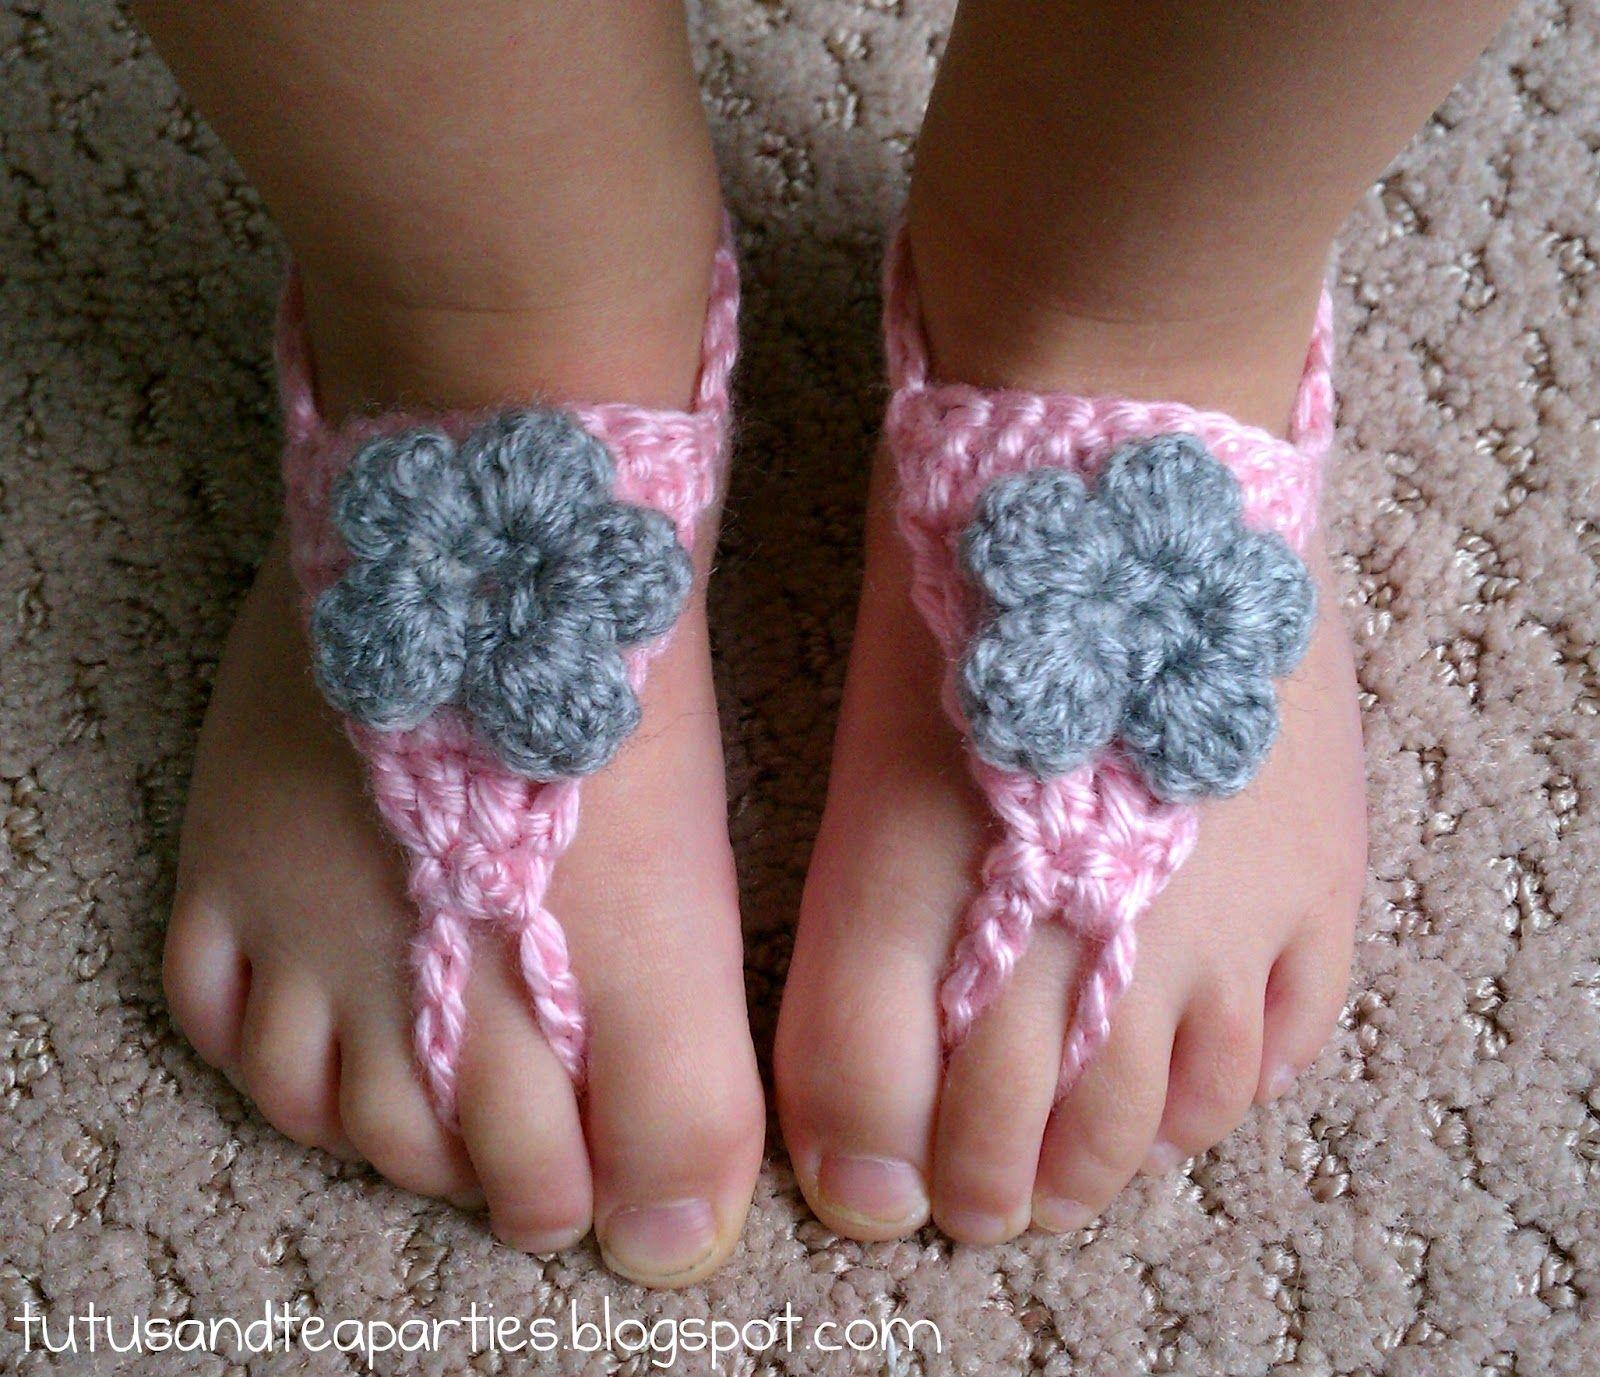 Tutus And Tea Parties Crochet Barefoot Sandal Free Crochet Pattern Crochet Baby Sandals Pattern Crochet Baby Sandals Barefoot Sandals Crochet Pattern